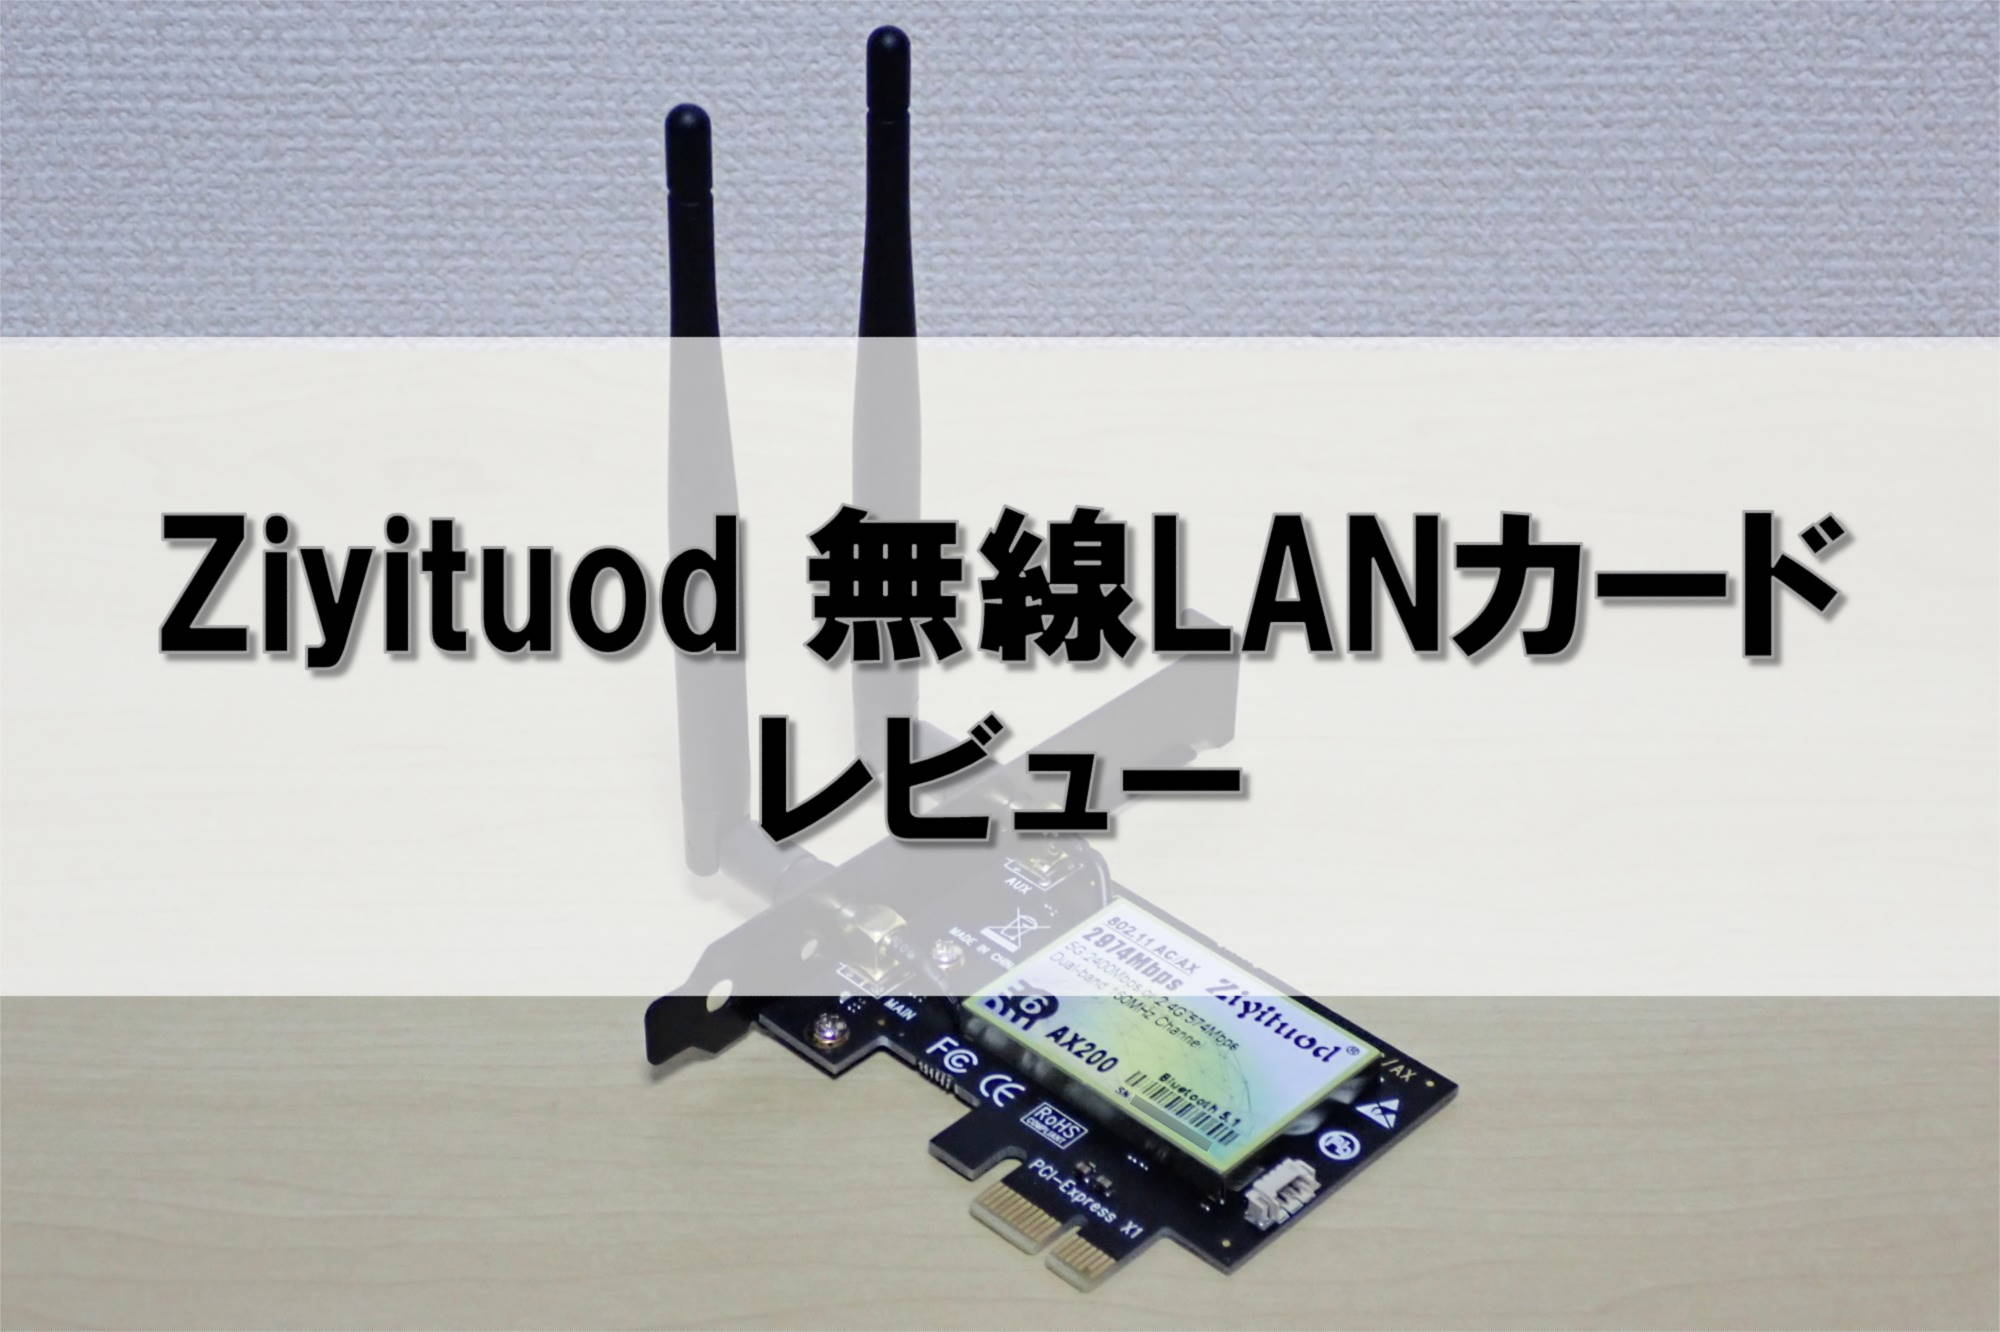 Ziyituod 無線LANカード レビュー